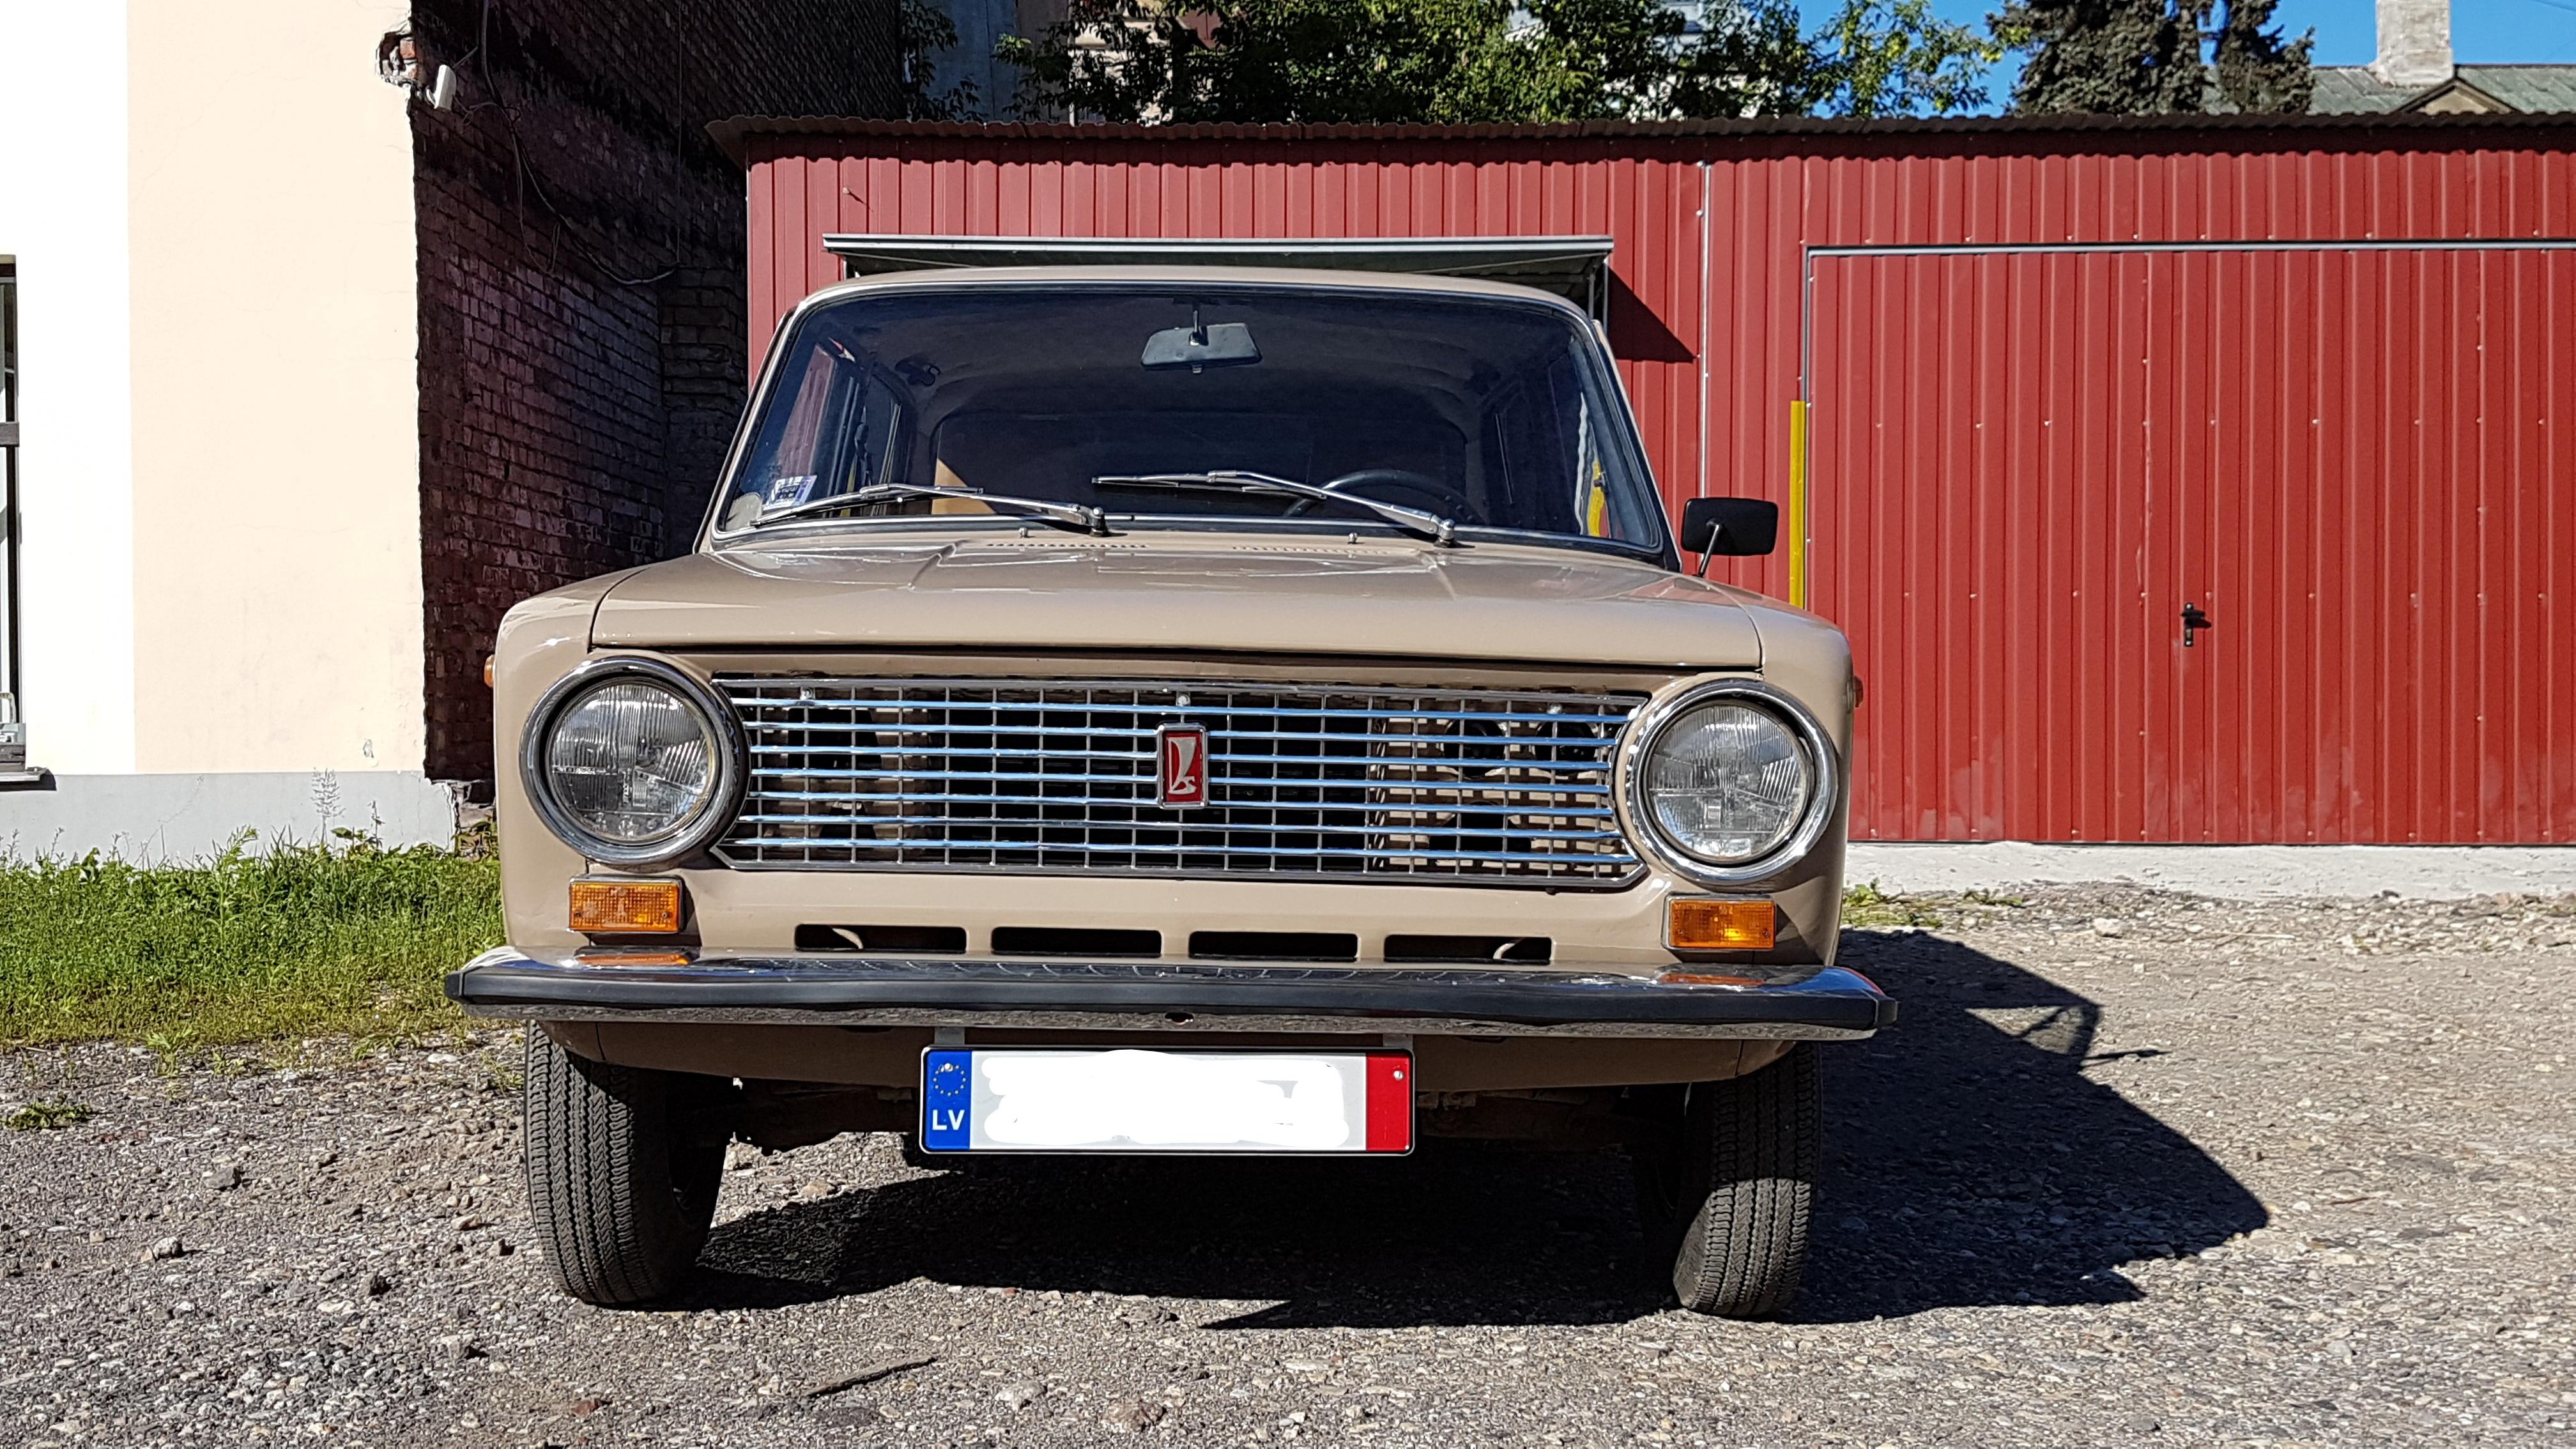 lada 1200, Vaz 2101 depuis la Lettonie!! - Page 2 43203520170715174823LI